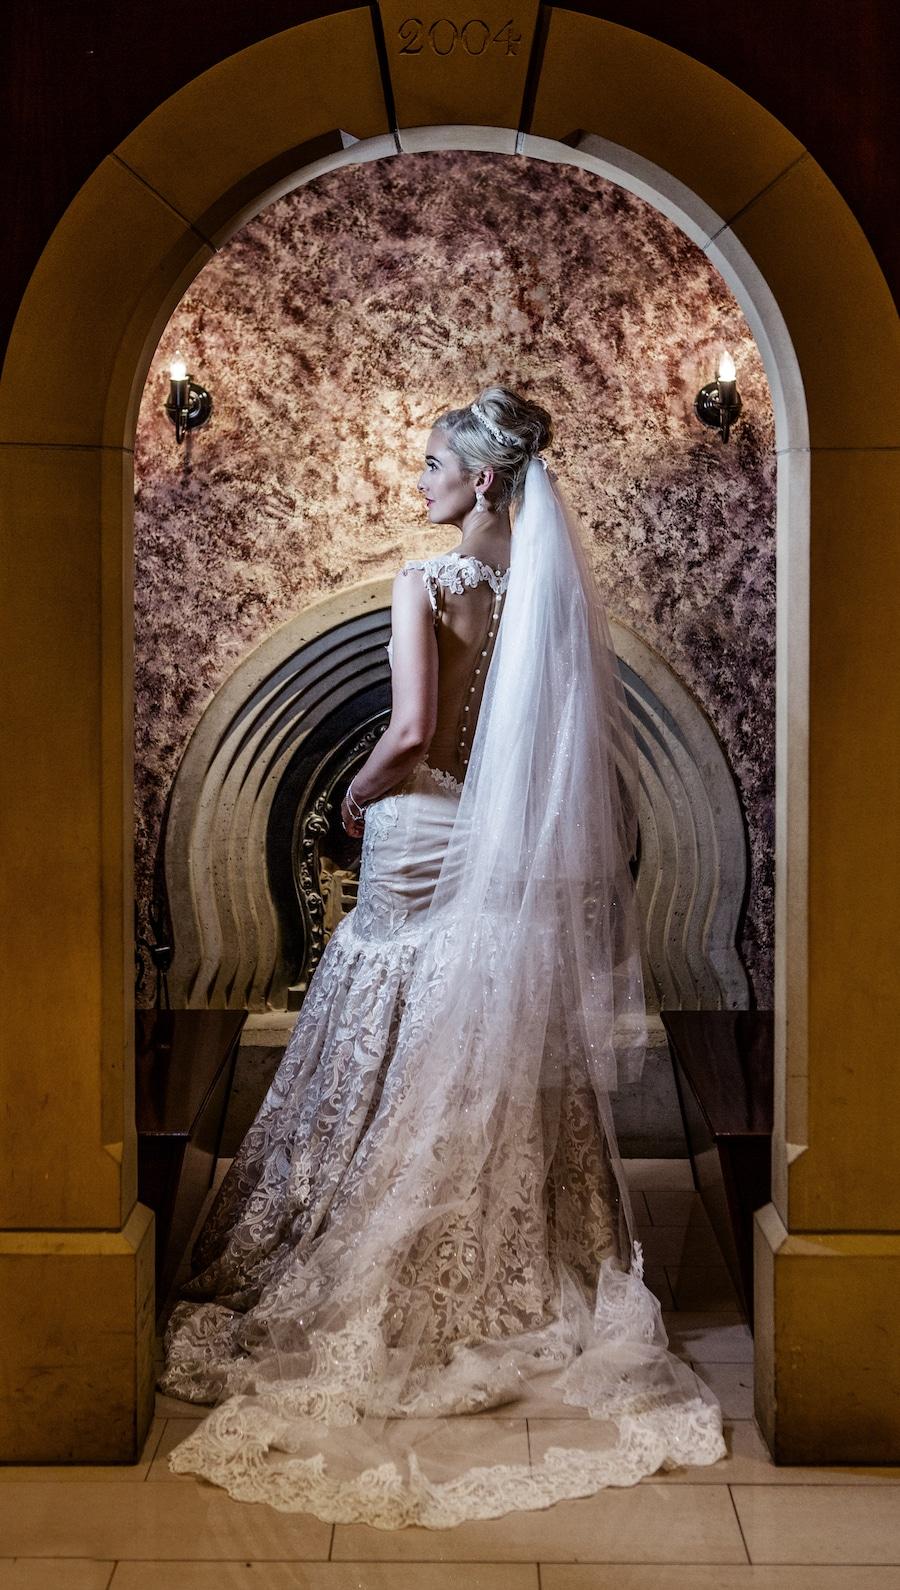 Naama and Anat, Naama and Anat Haute Couture, Irish Wedding, couture wedding gown, wedding dress, Ireland, Harveys Point, Glendowan